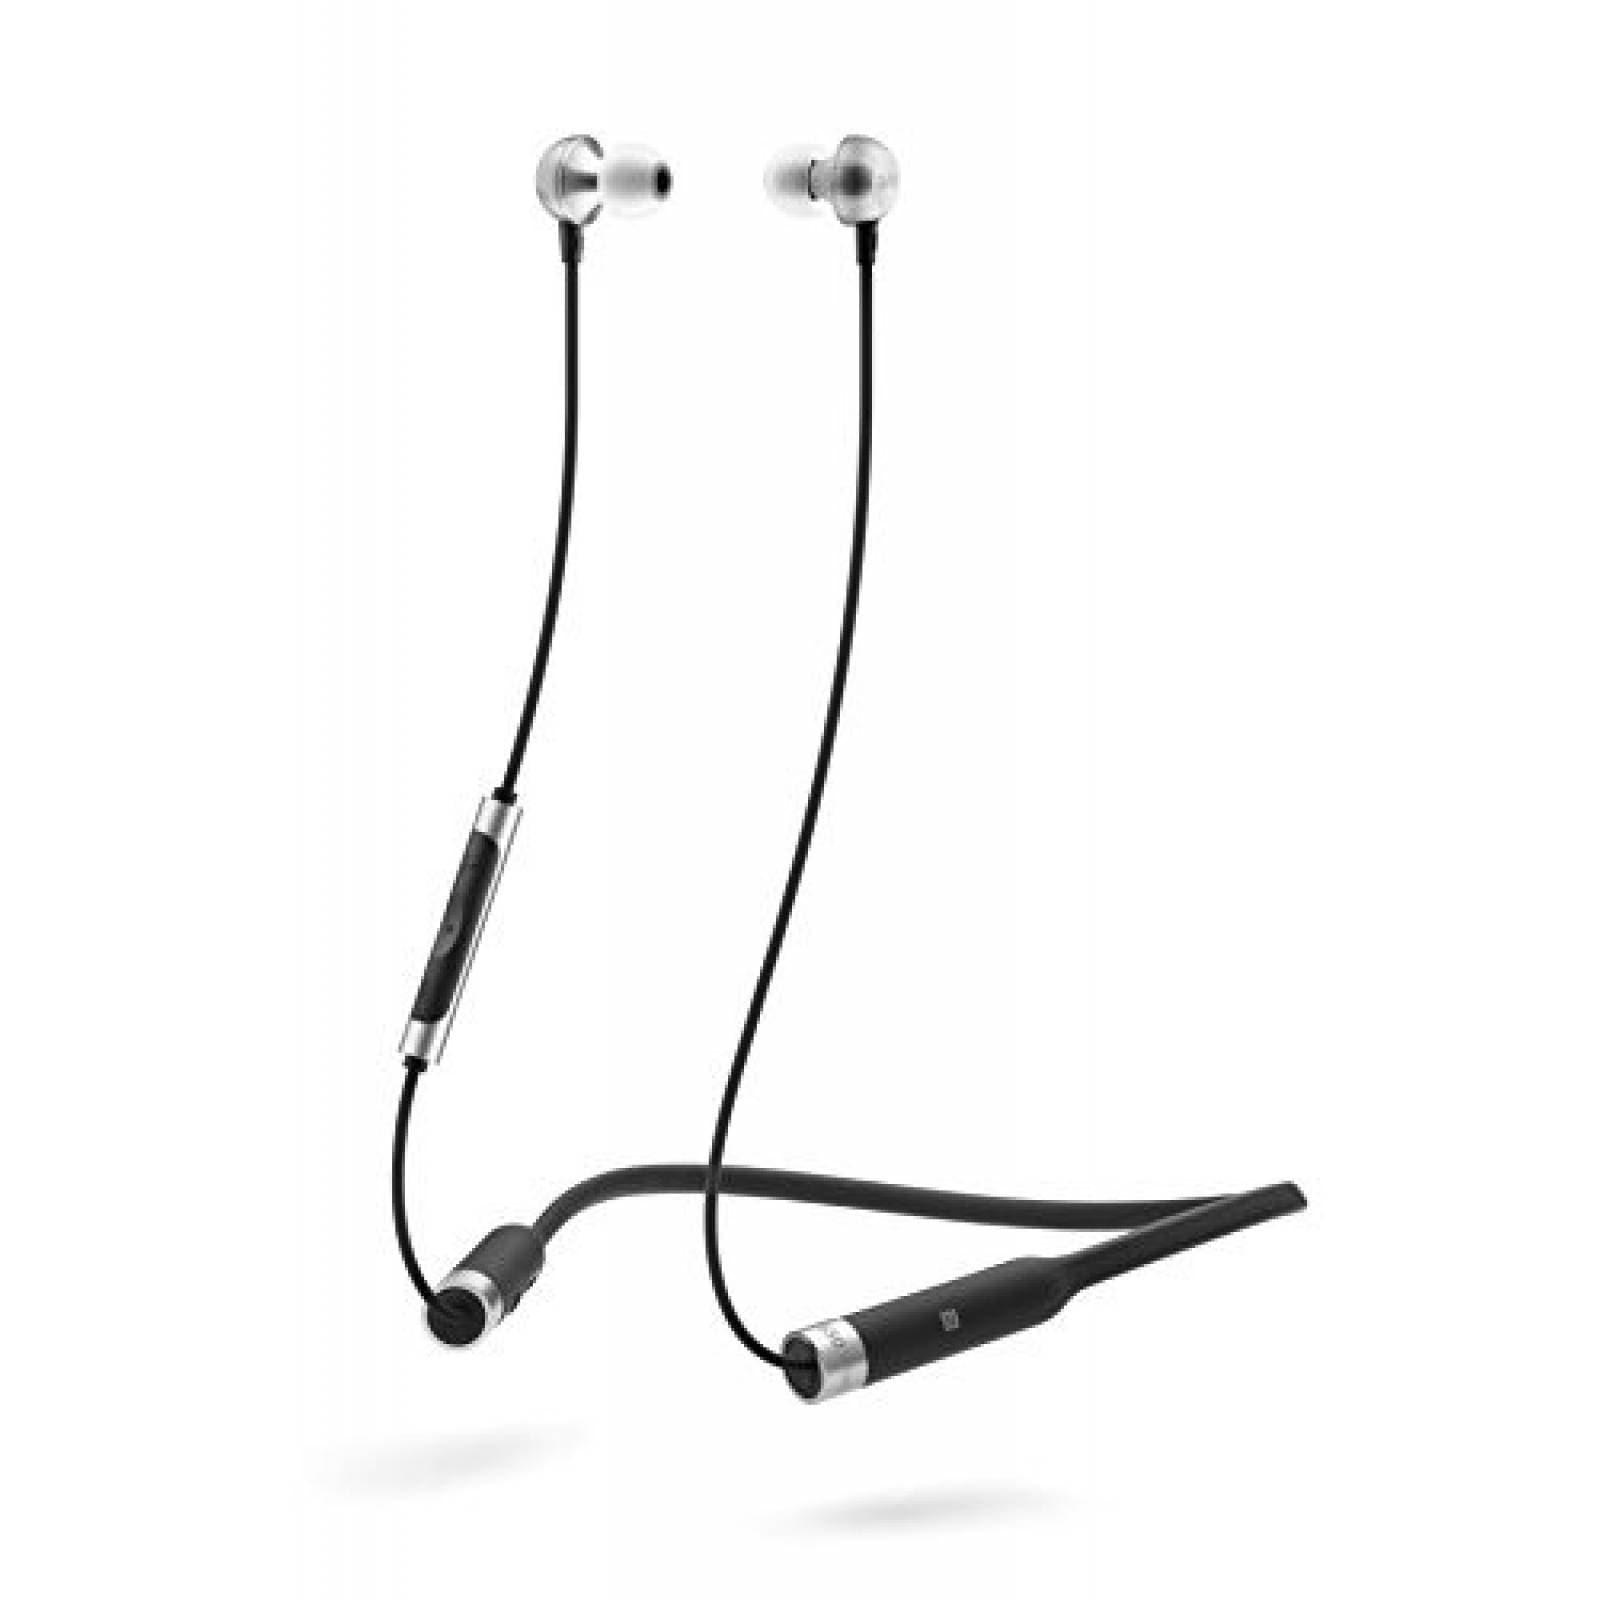 Audífonos RHA MA650 Bluetooth 12hrs Cable de Cuello -Negro